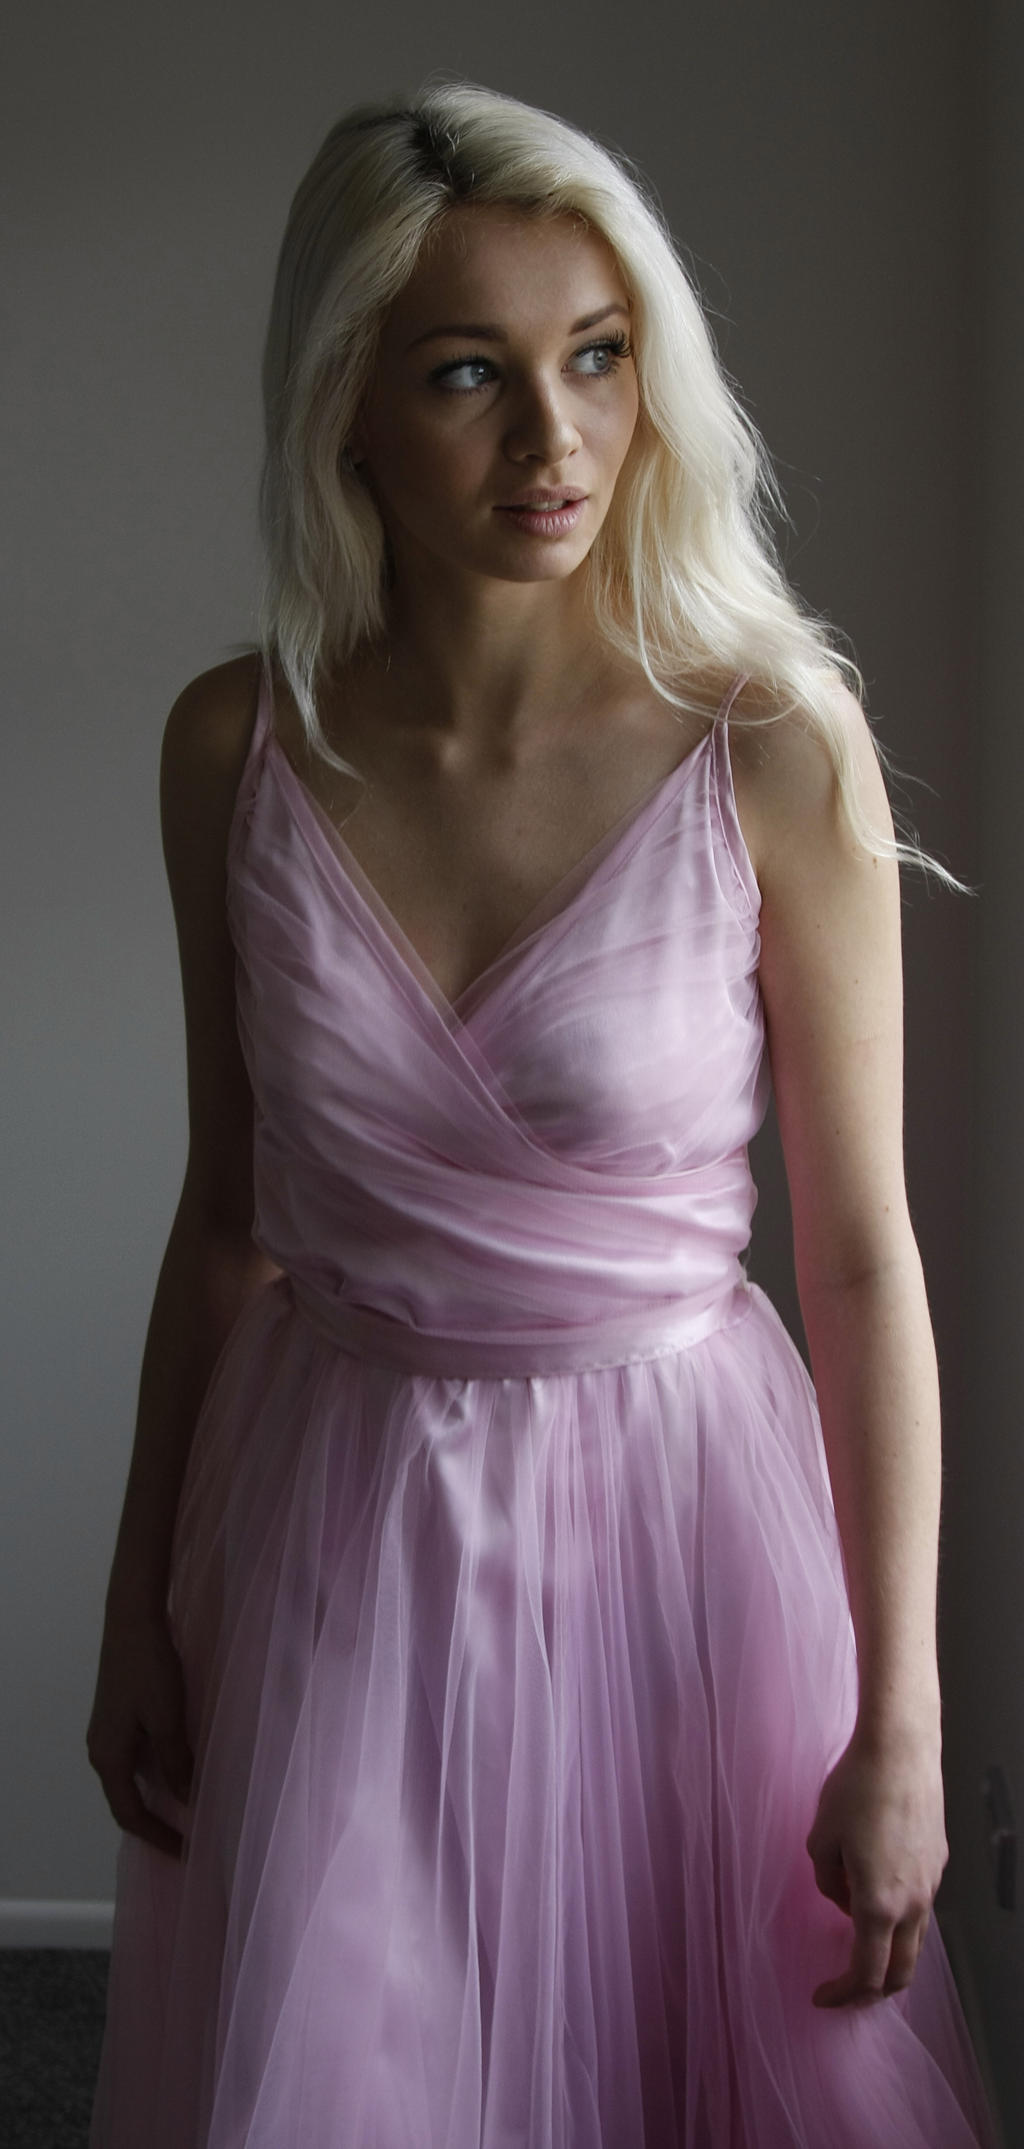 Georgia pink dress 9 by CathleenTarawhiti